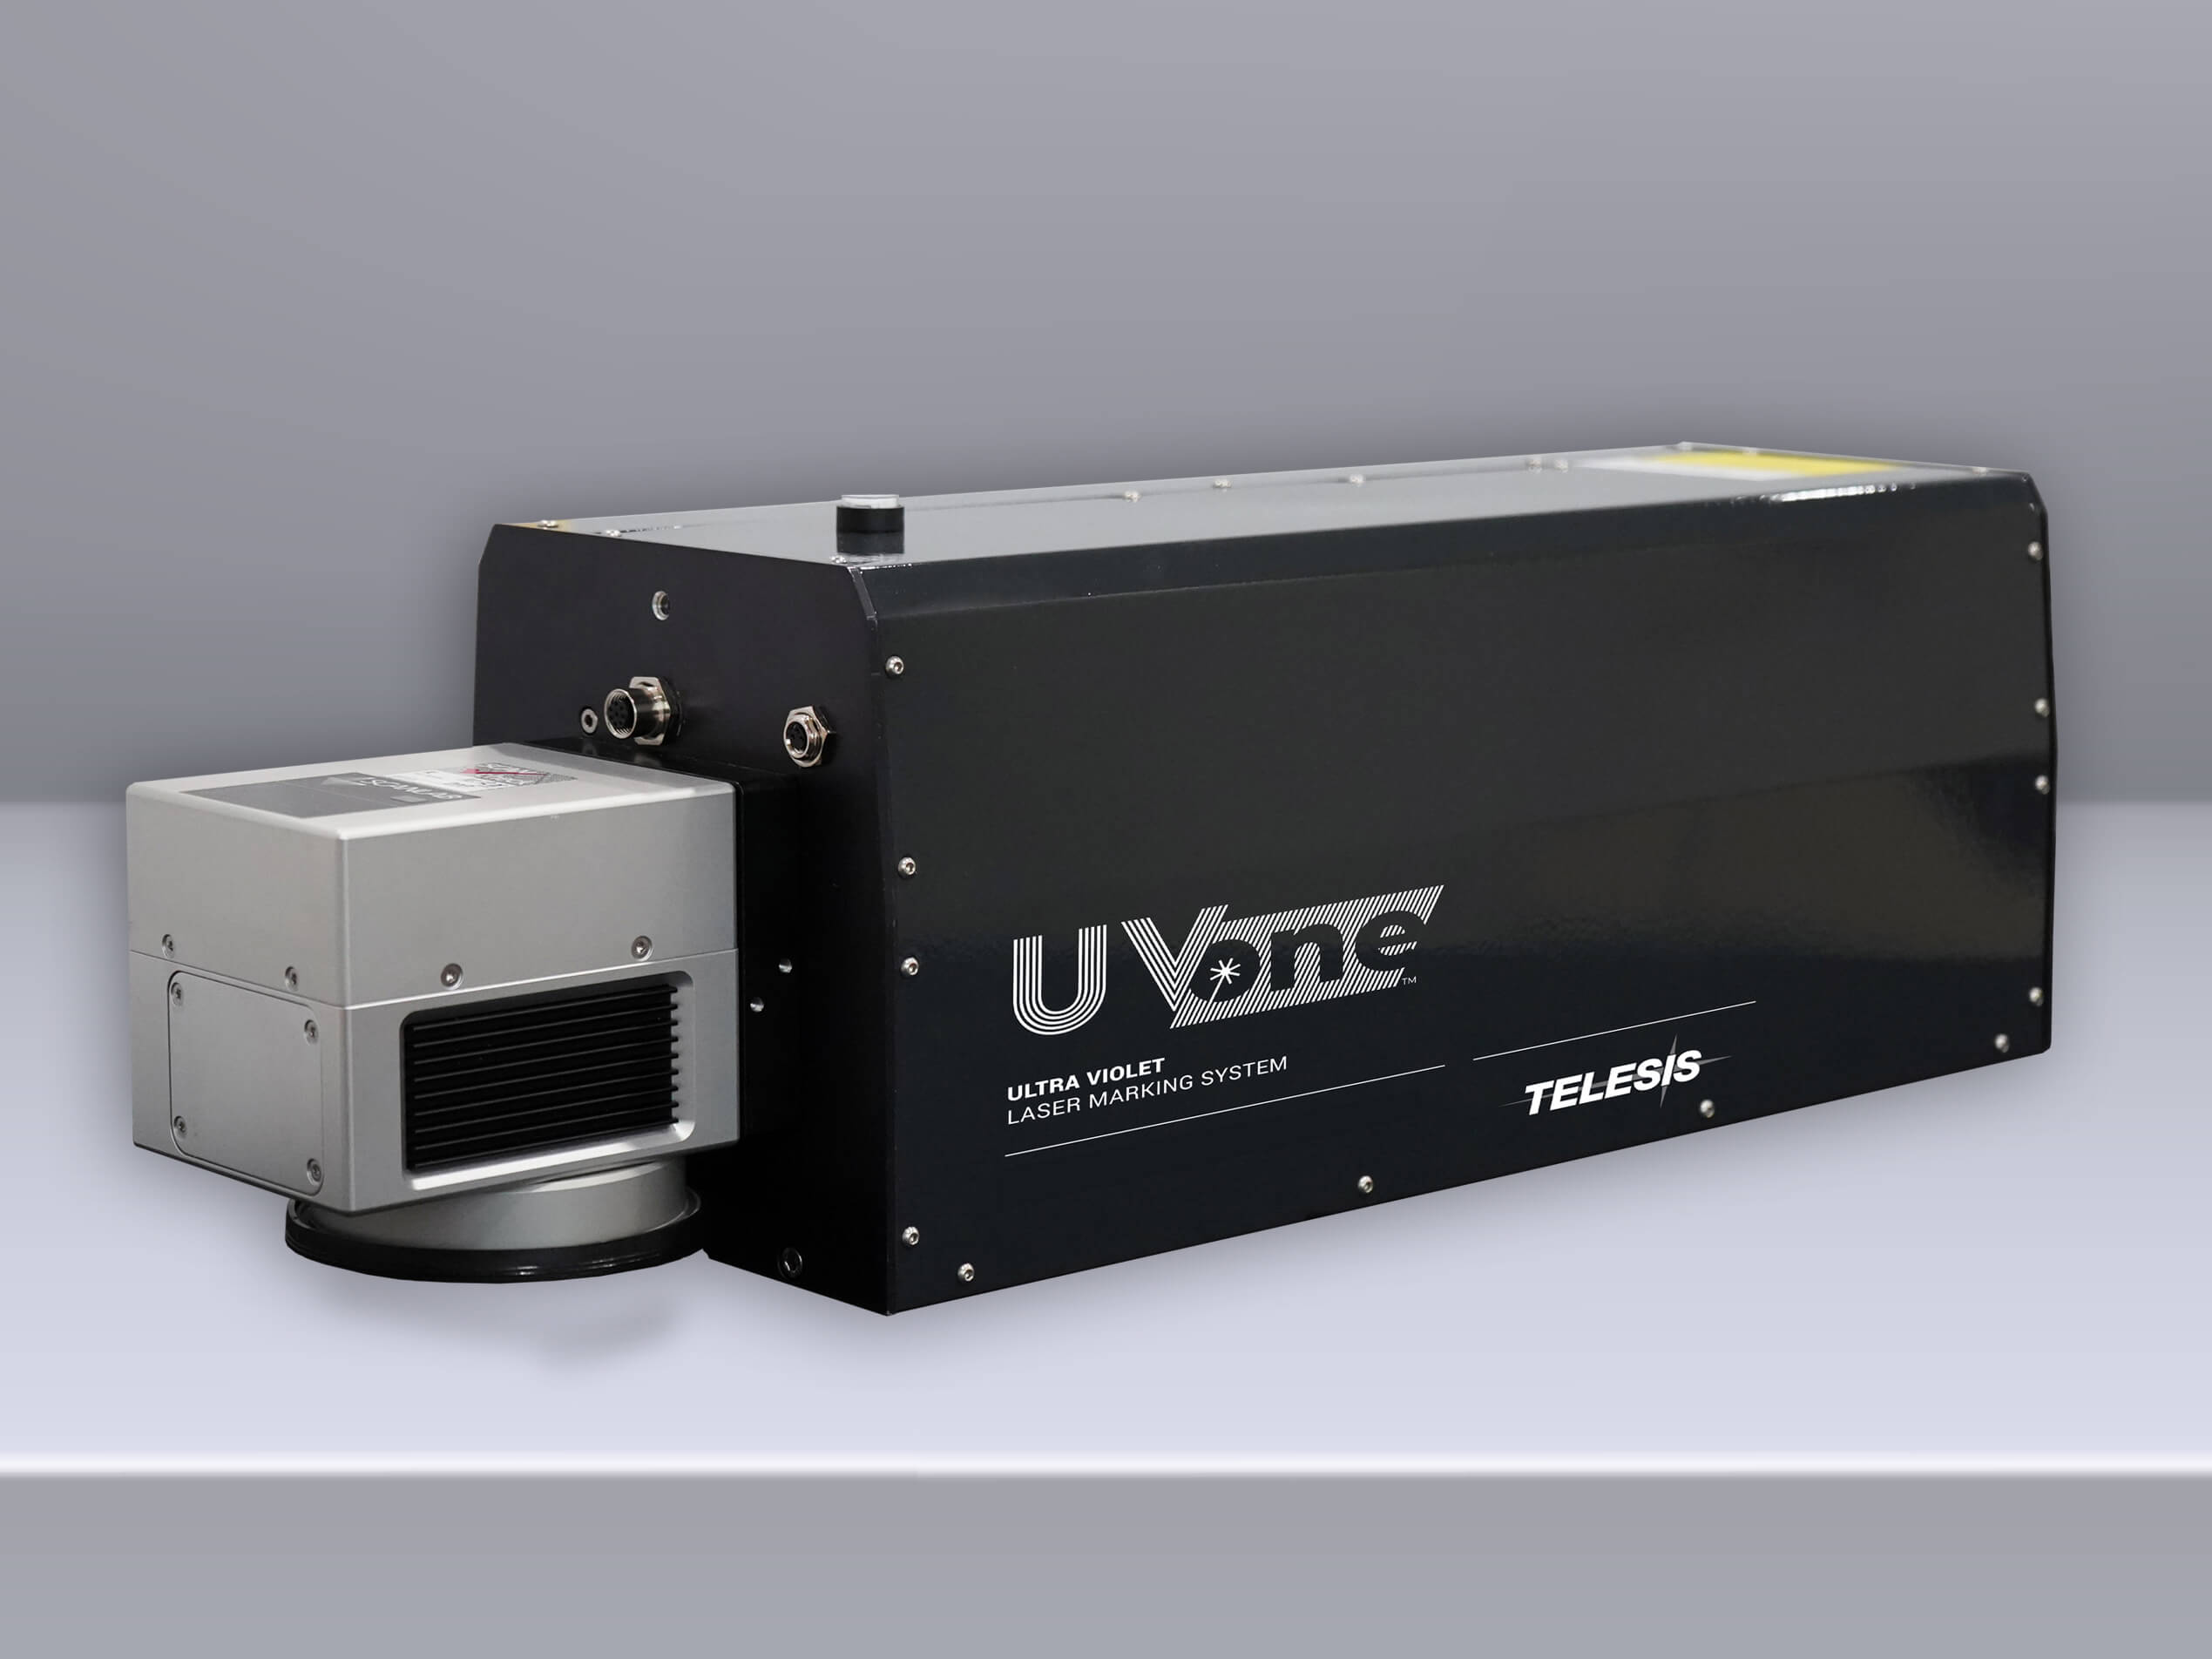 УФ лазерный маркер